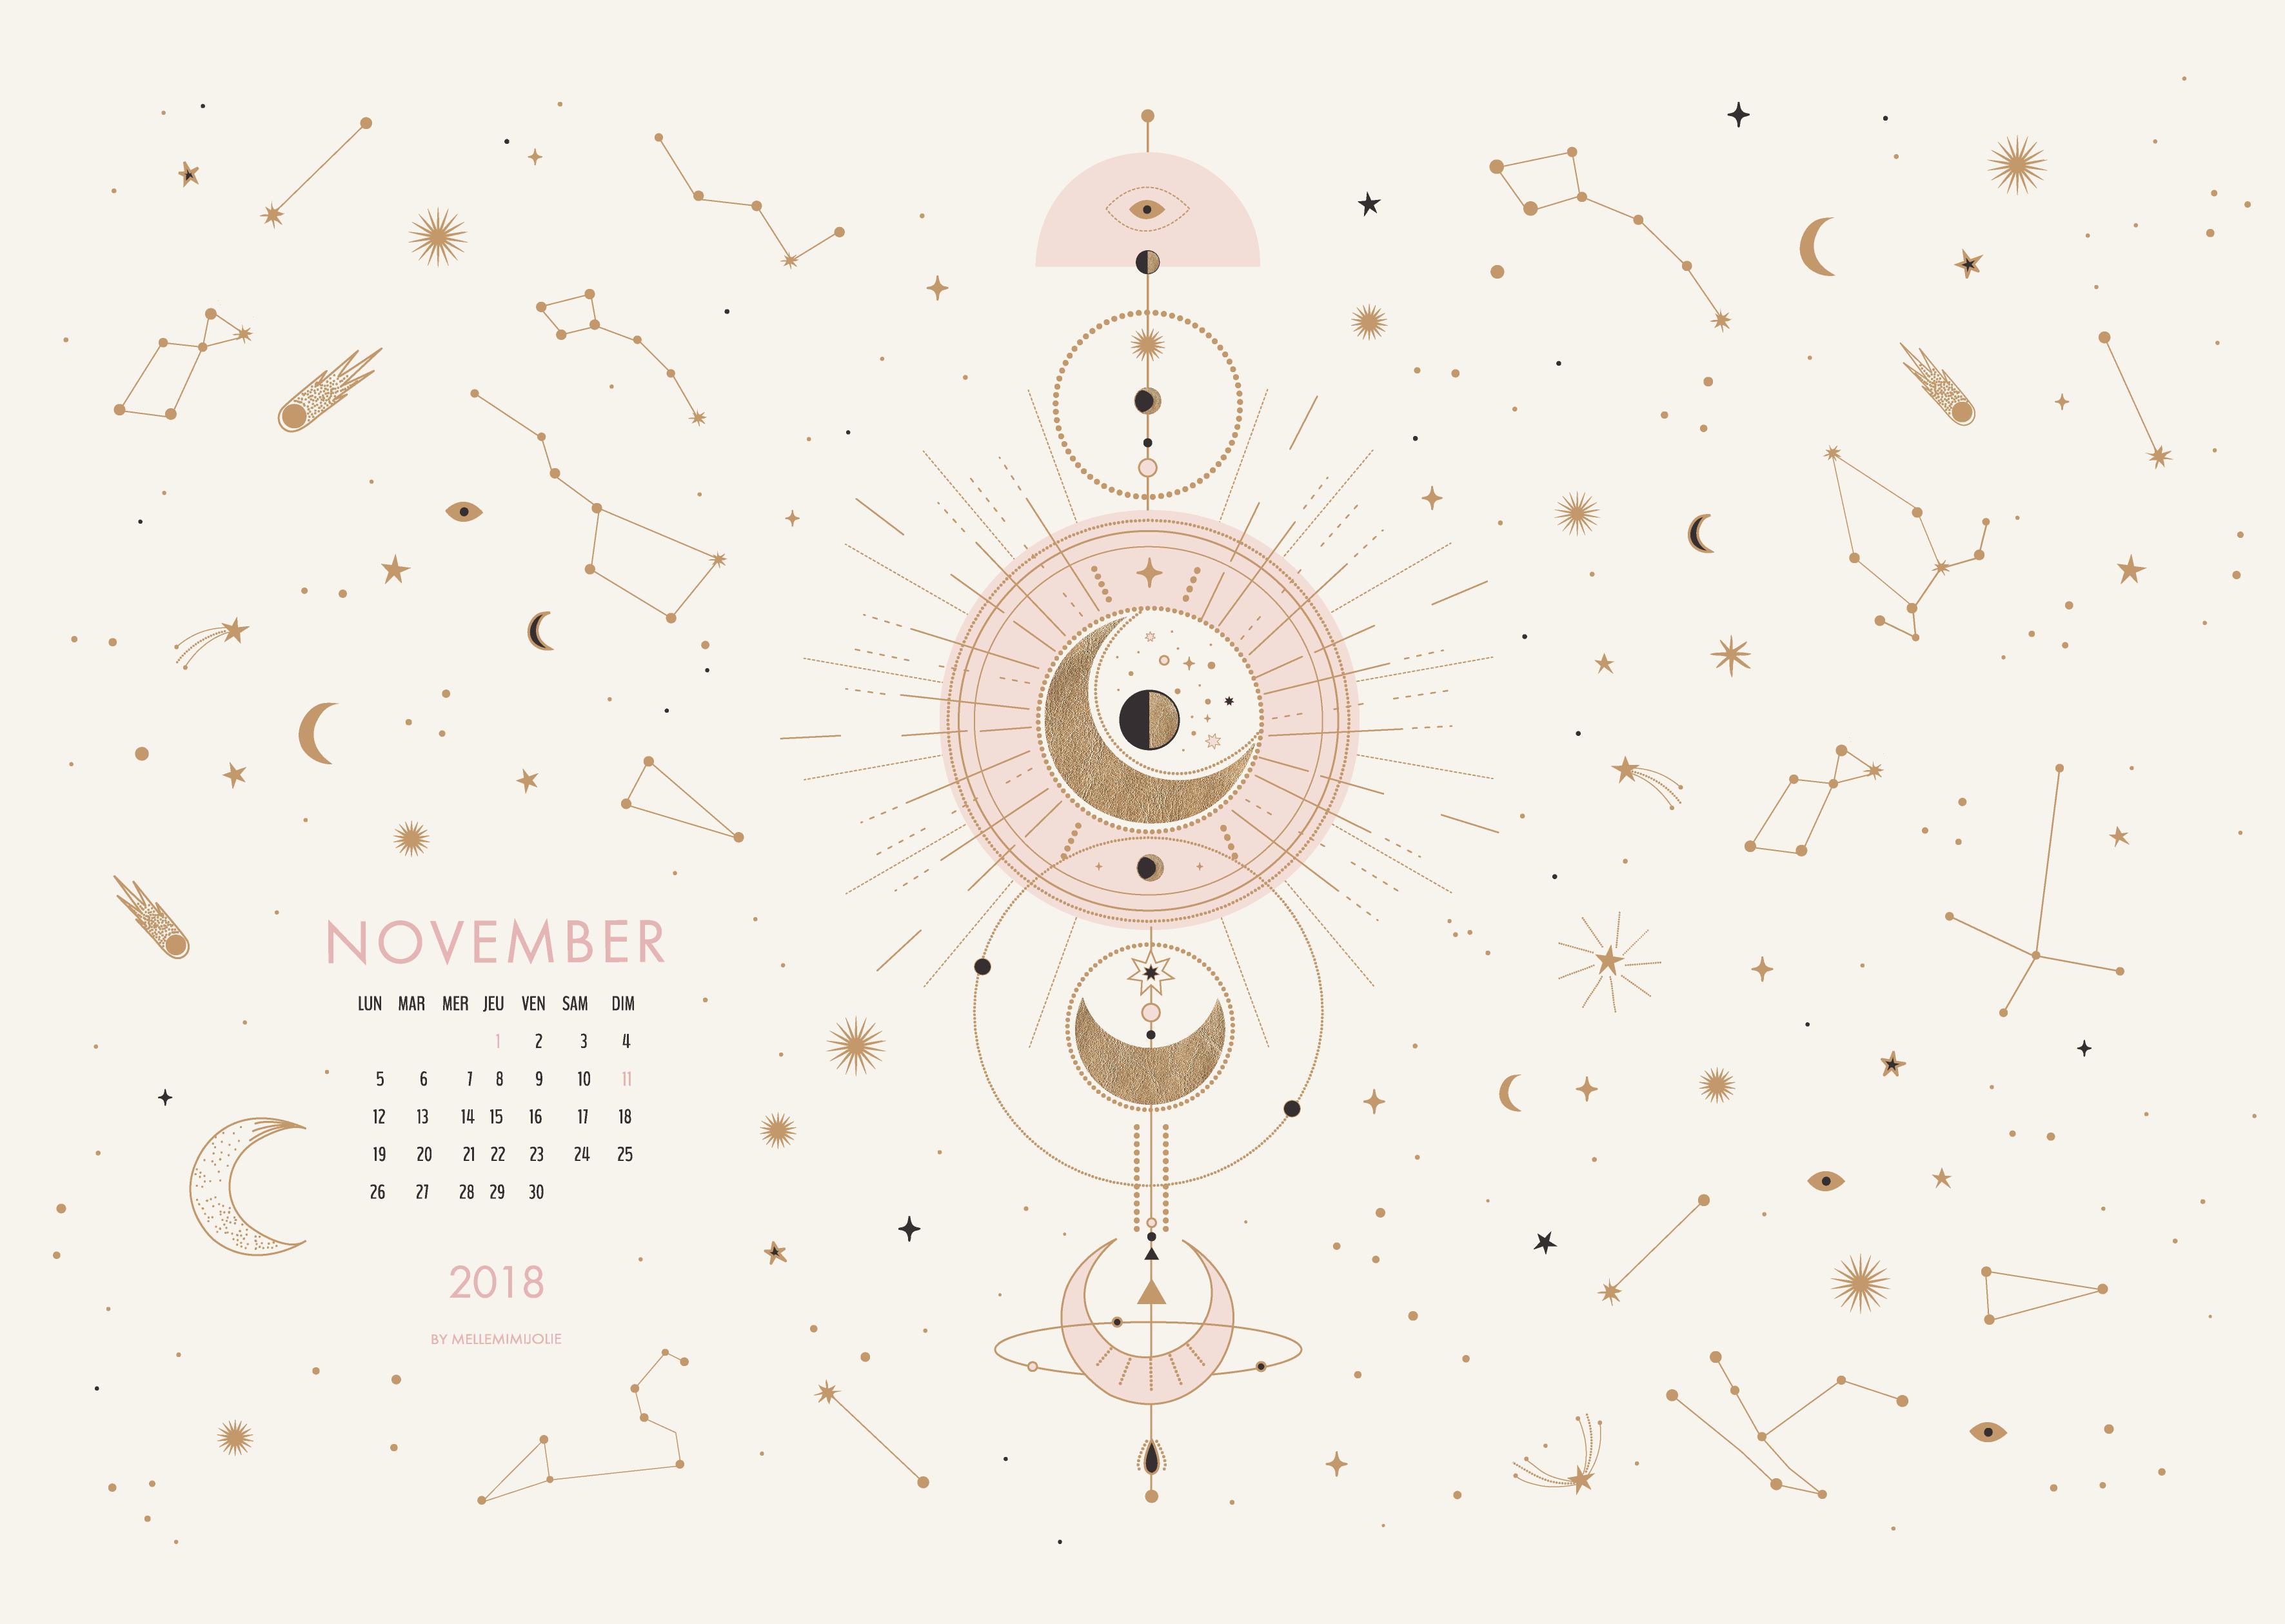 Constellations : le calendrier de Novembre   MelleMimijolie   Fond